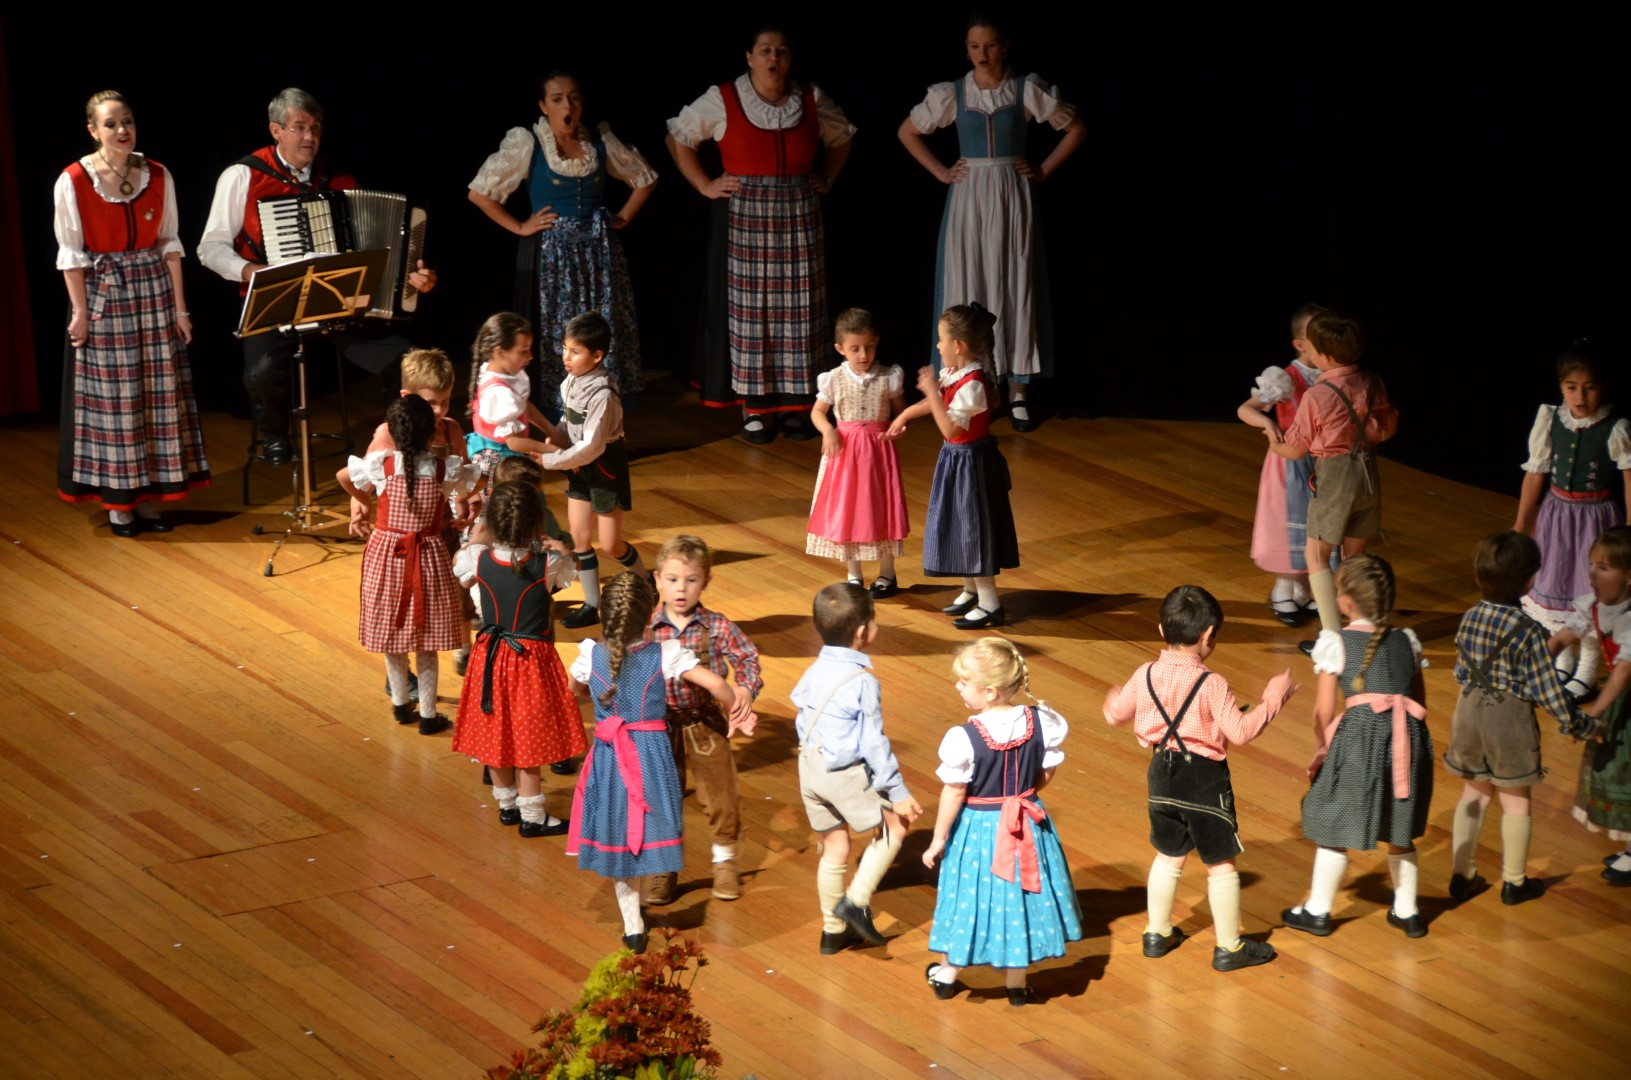 Programa Cultural Festa da Cevada - 06.10.2017Programa Cultural Festa da Cevada - 06.10.2017